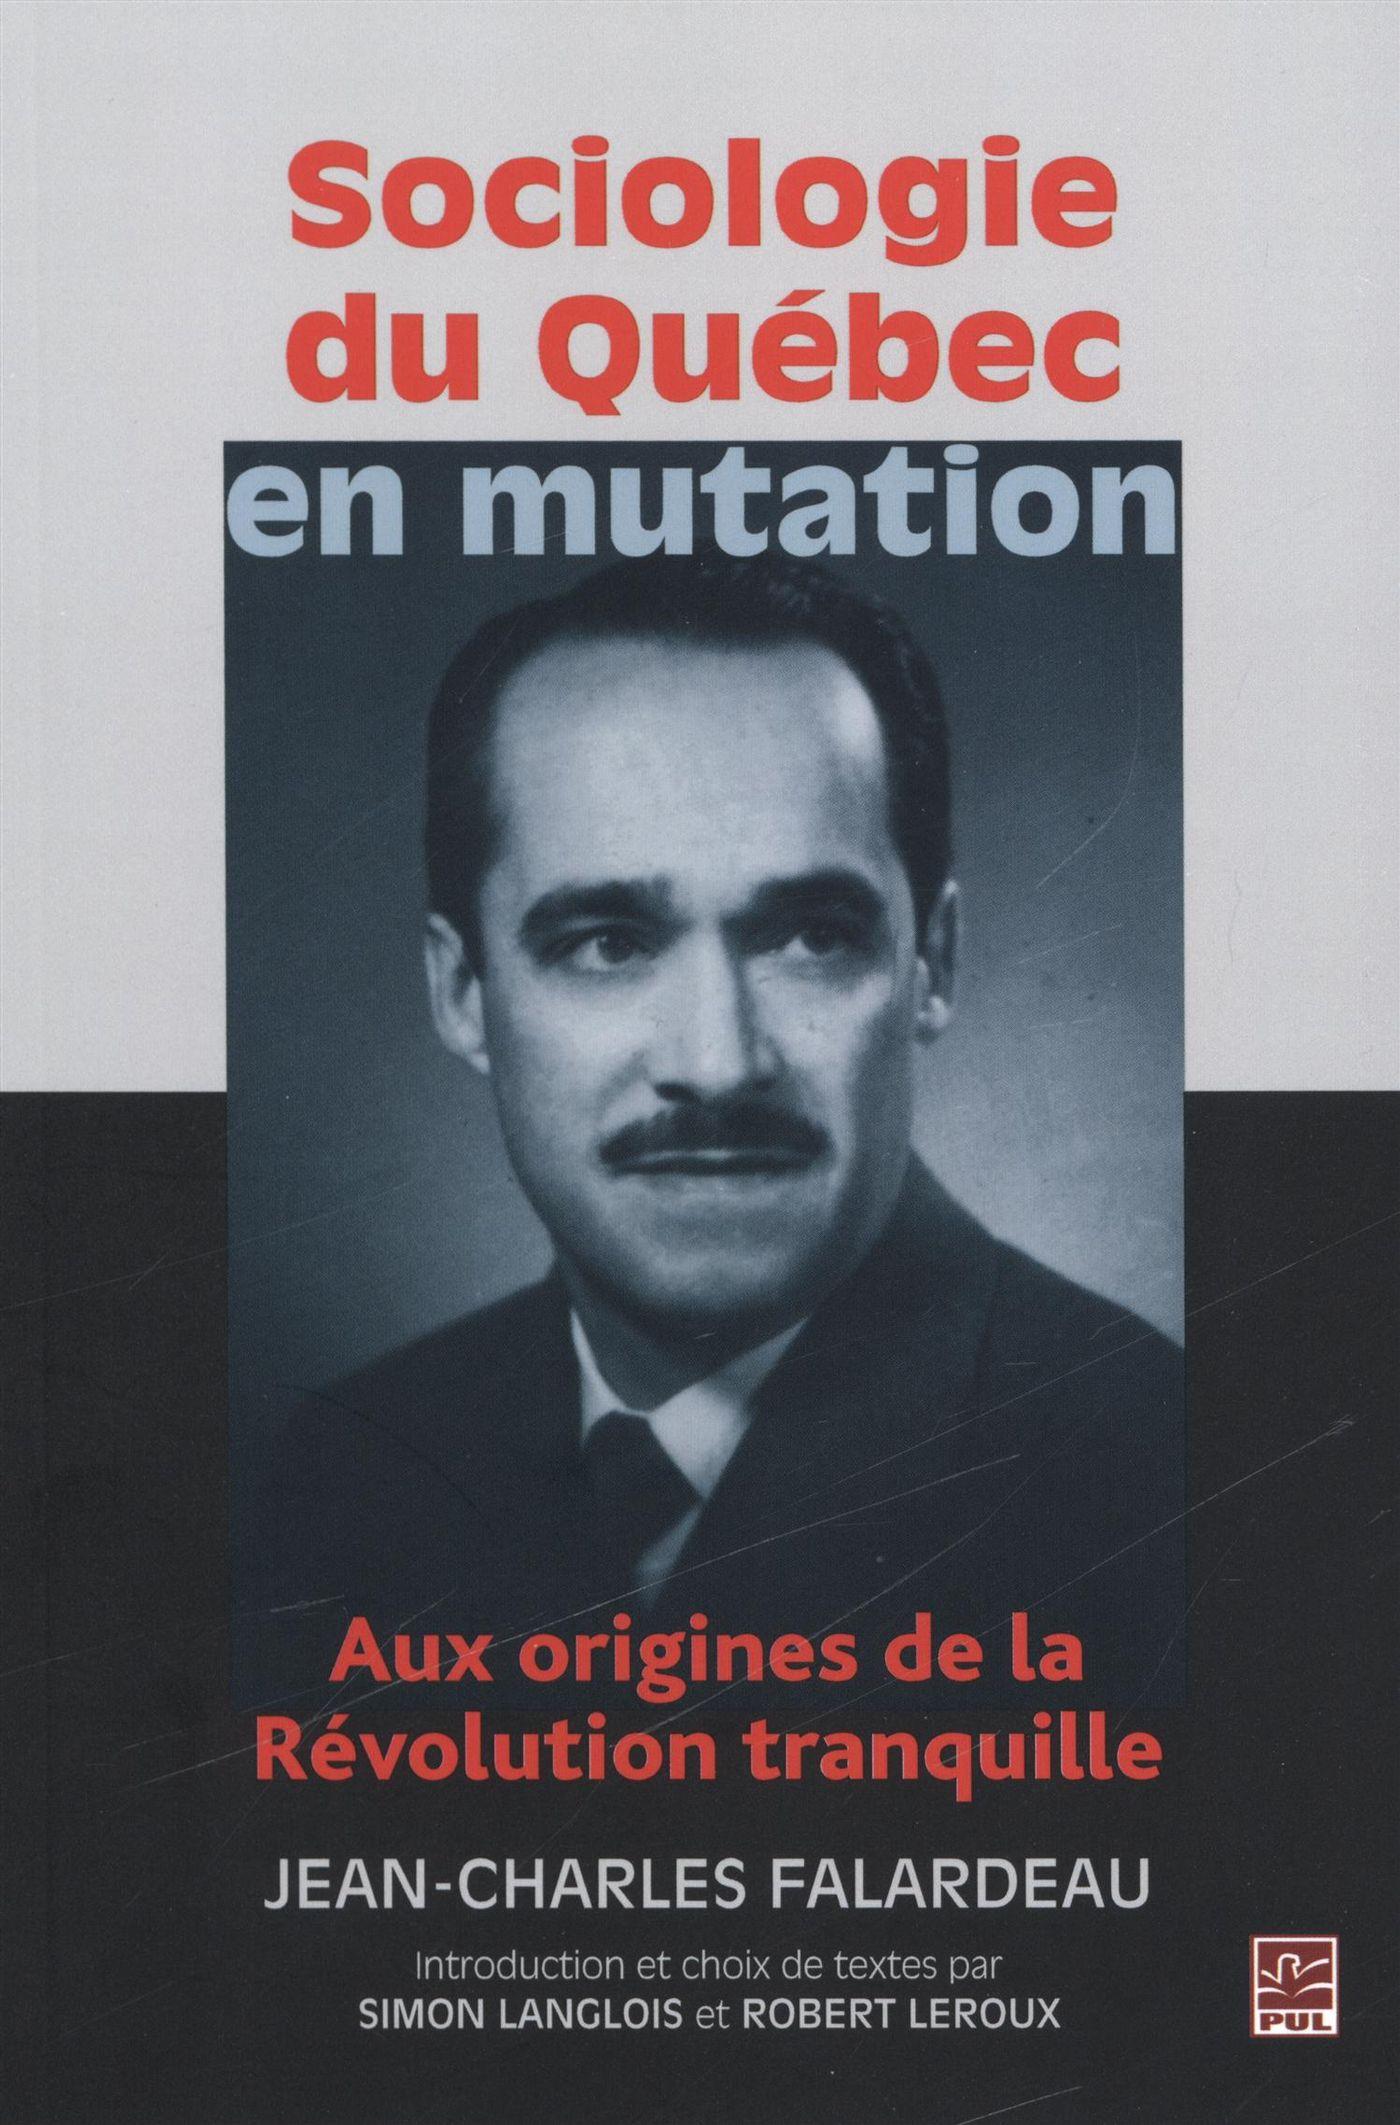 Sociologie du Québec en mutation